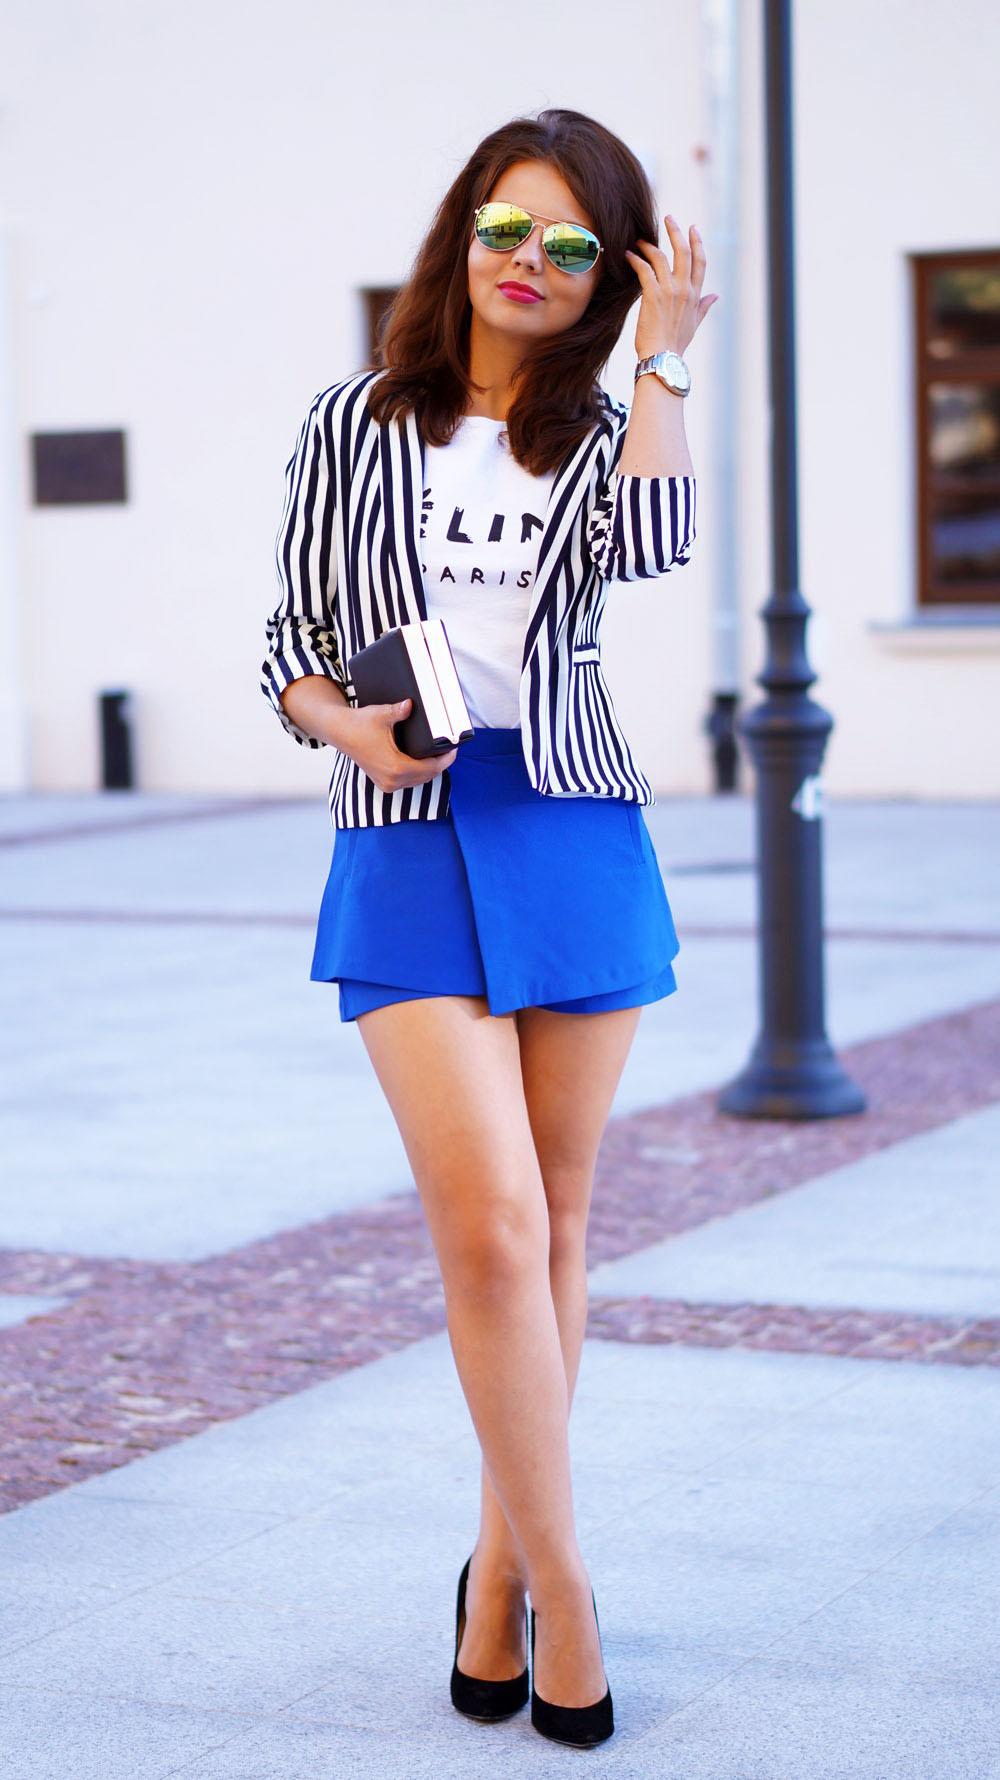 Odzież damska, buty, akcesoria - ochboutique